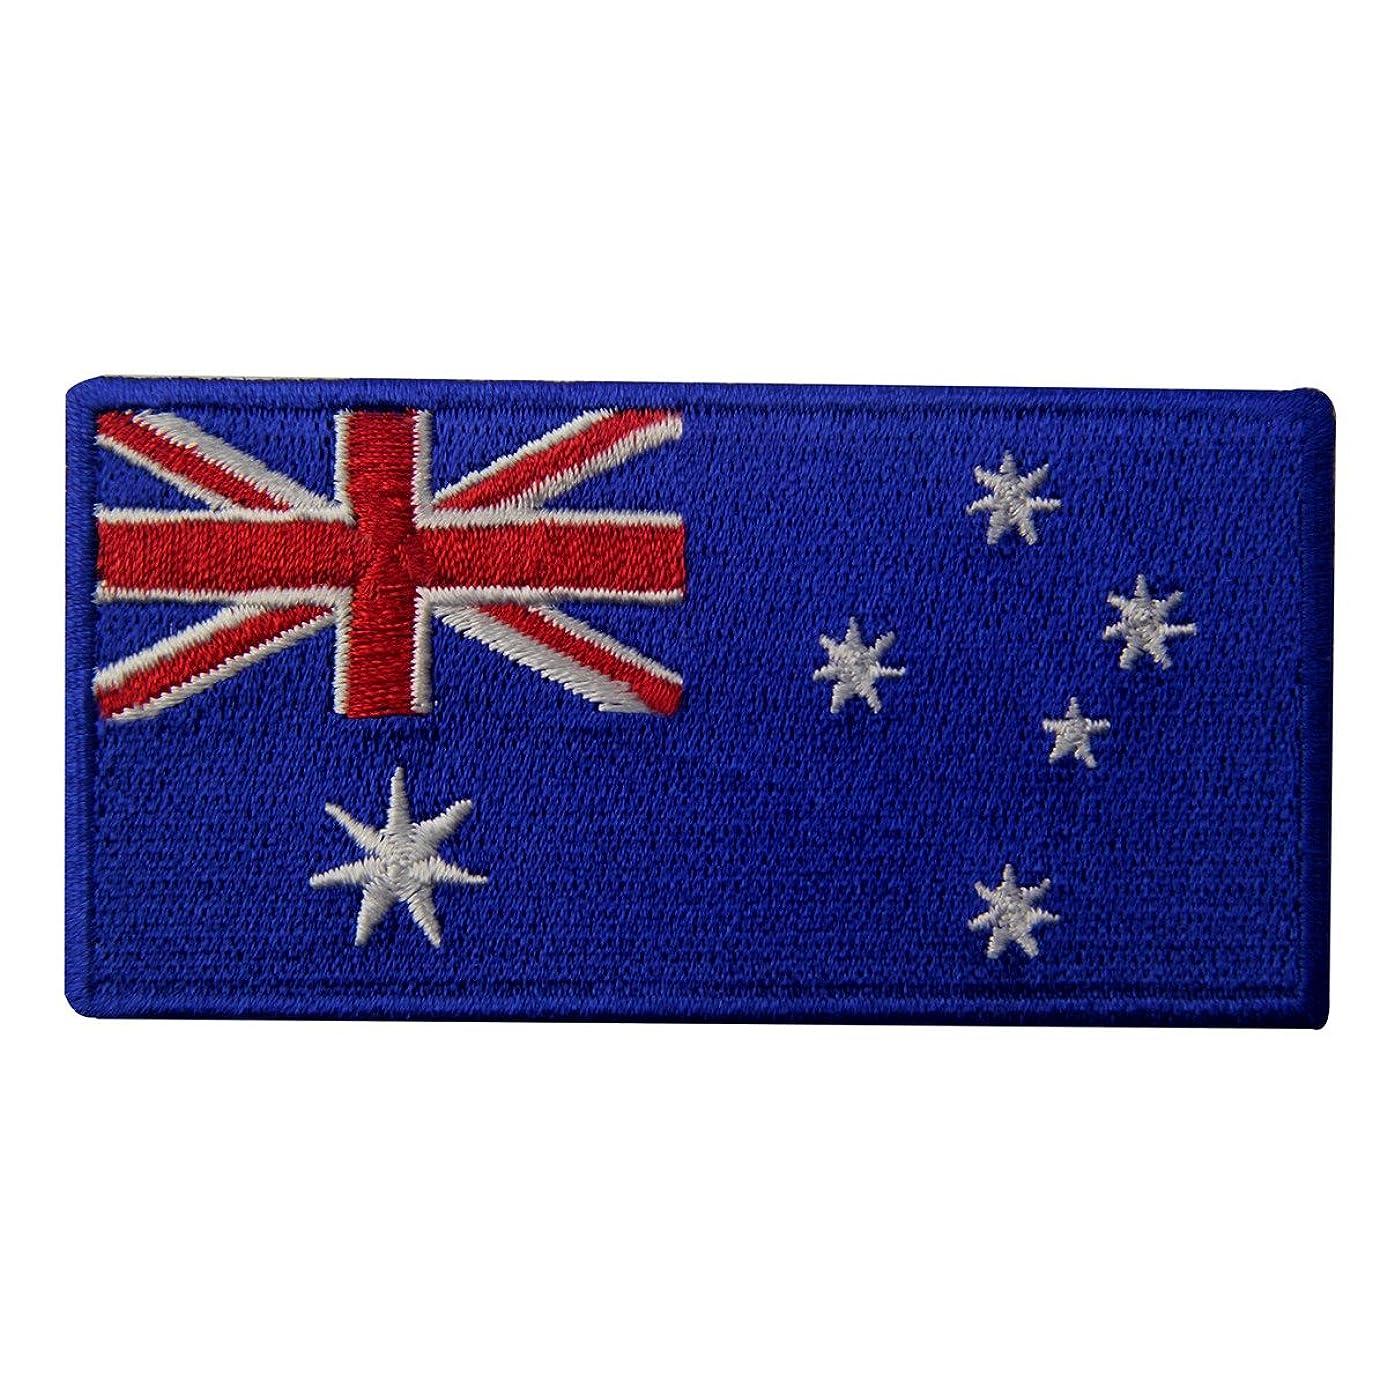 Australia Flag Embroidered Patch Australian Iron On Sew On National Emblem